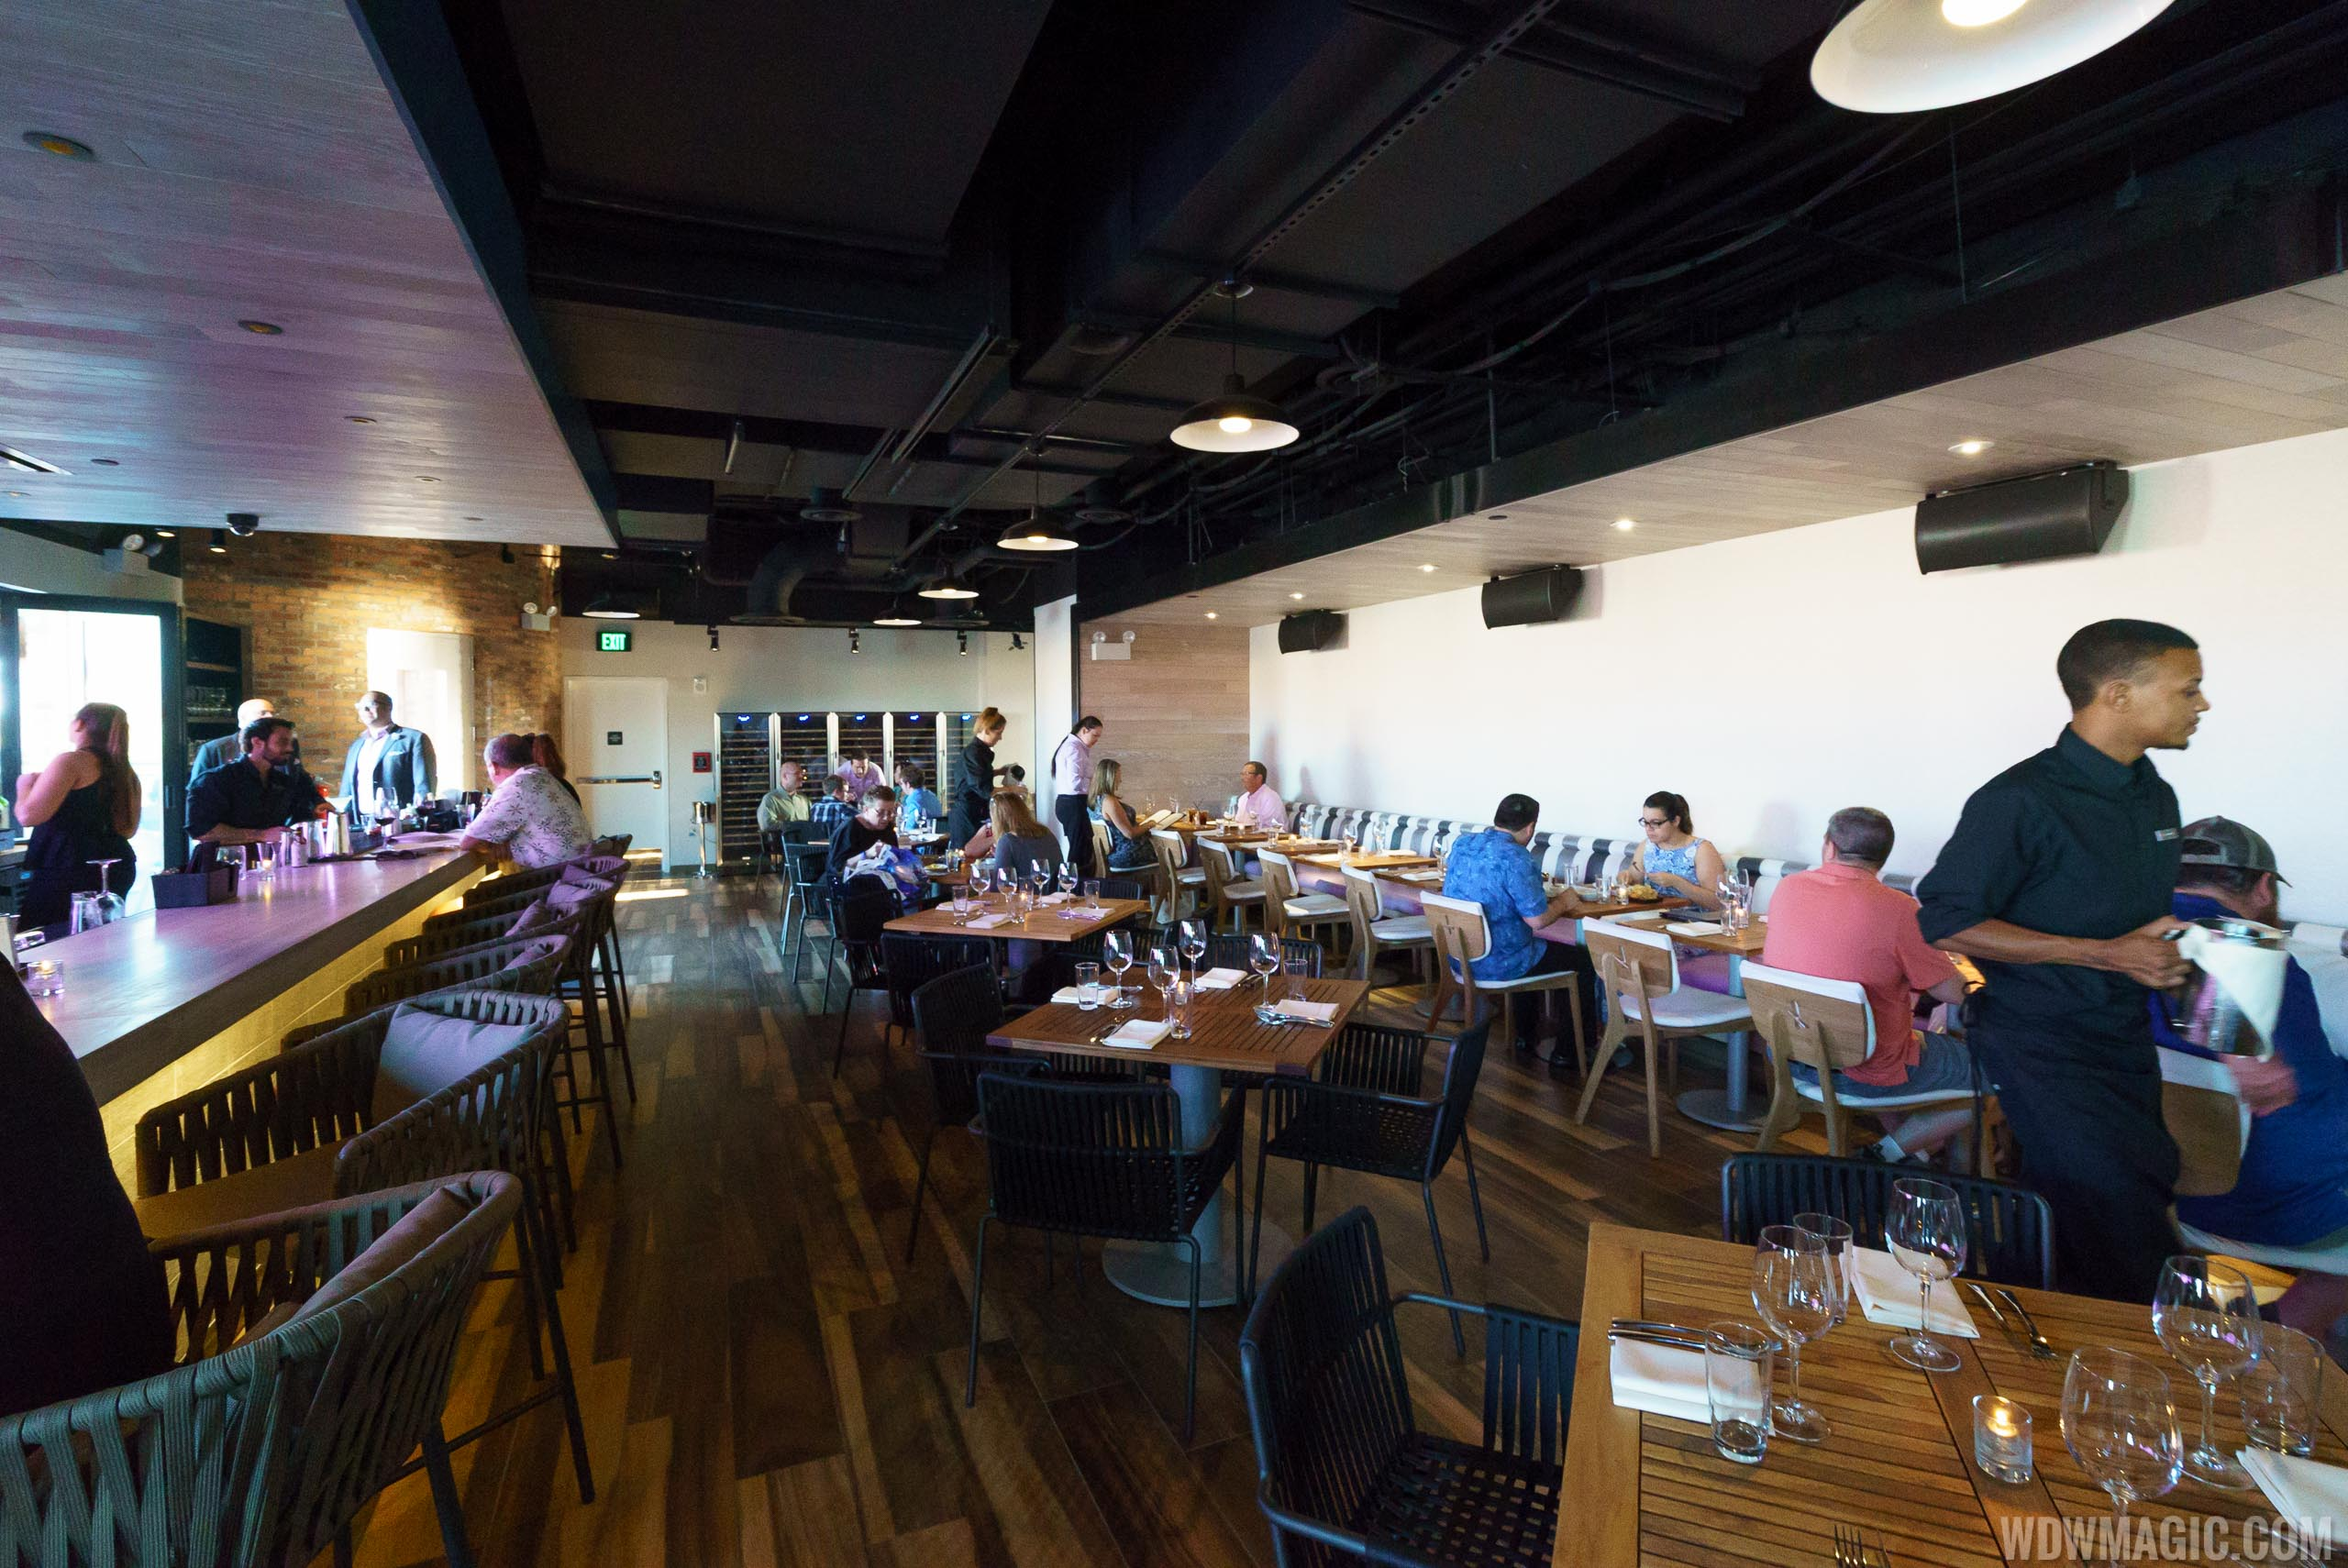 STK Orlando - Upper level dining room and bar